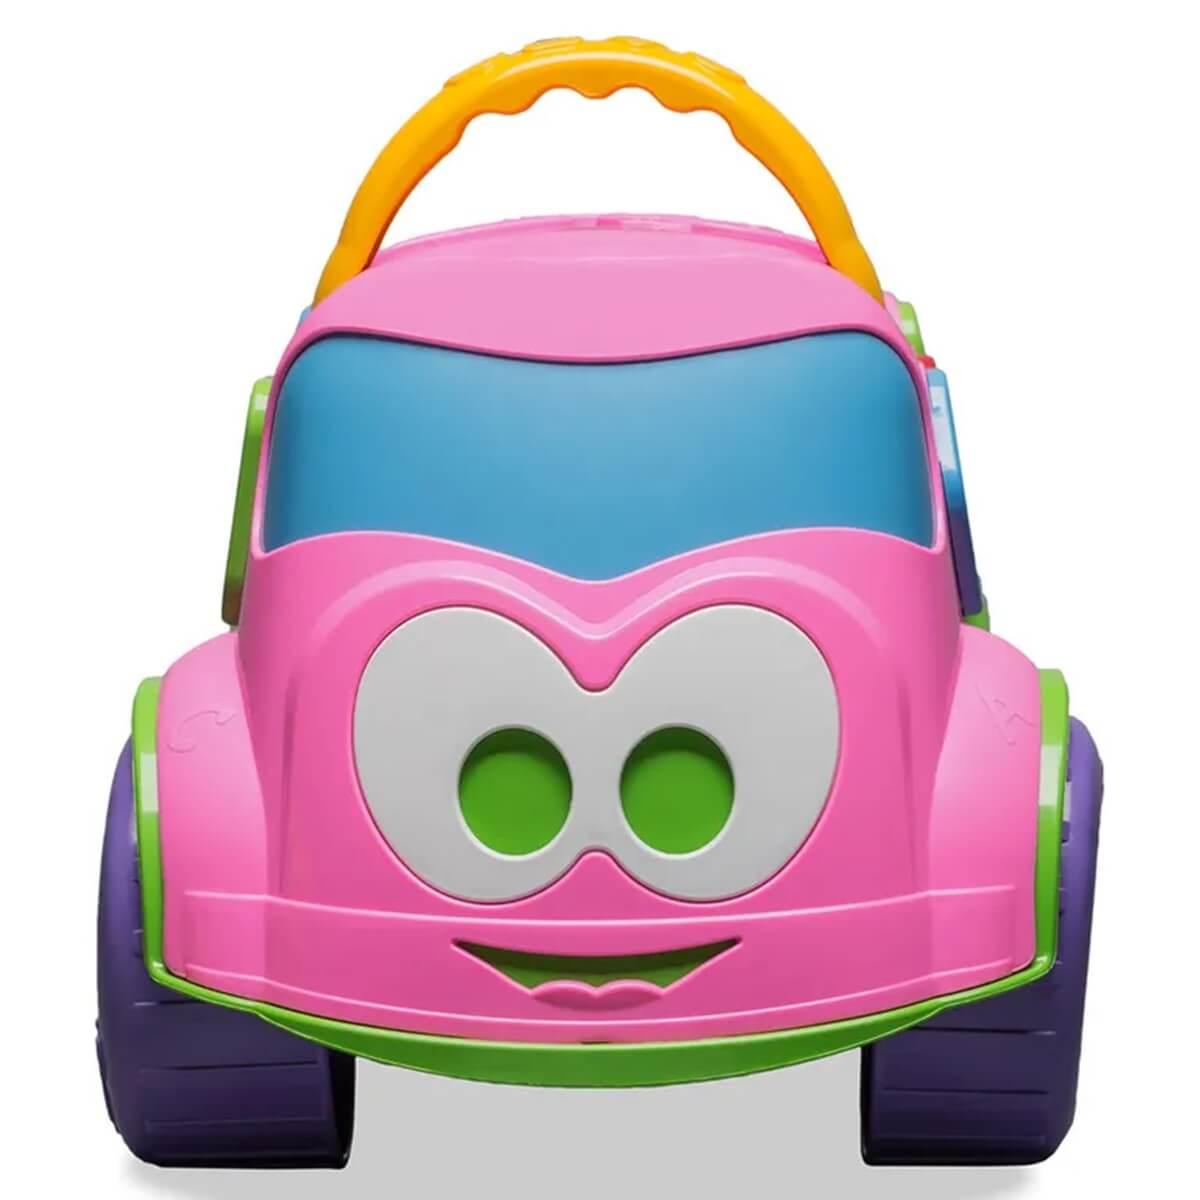 Carrinho Educativo Baby Land Dino Cardoso Toys 3028